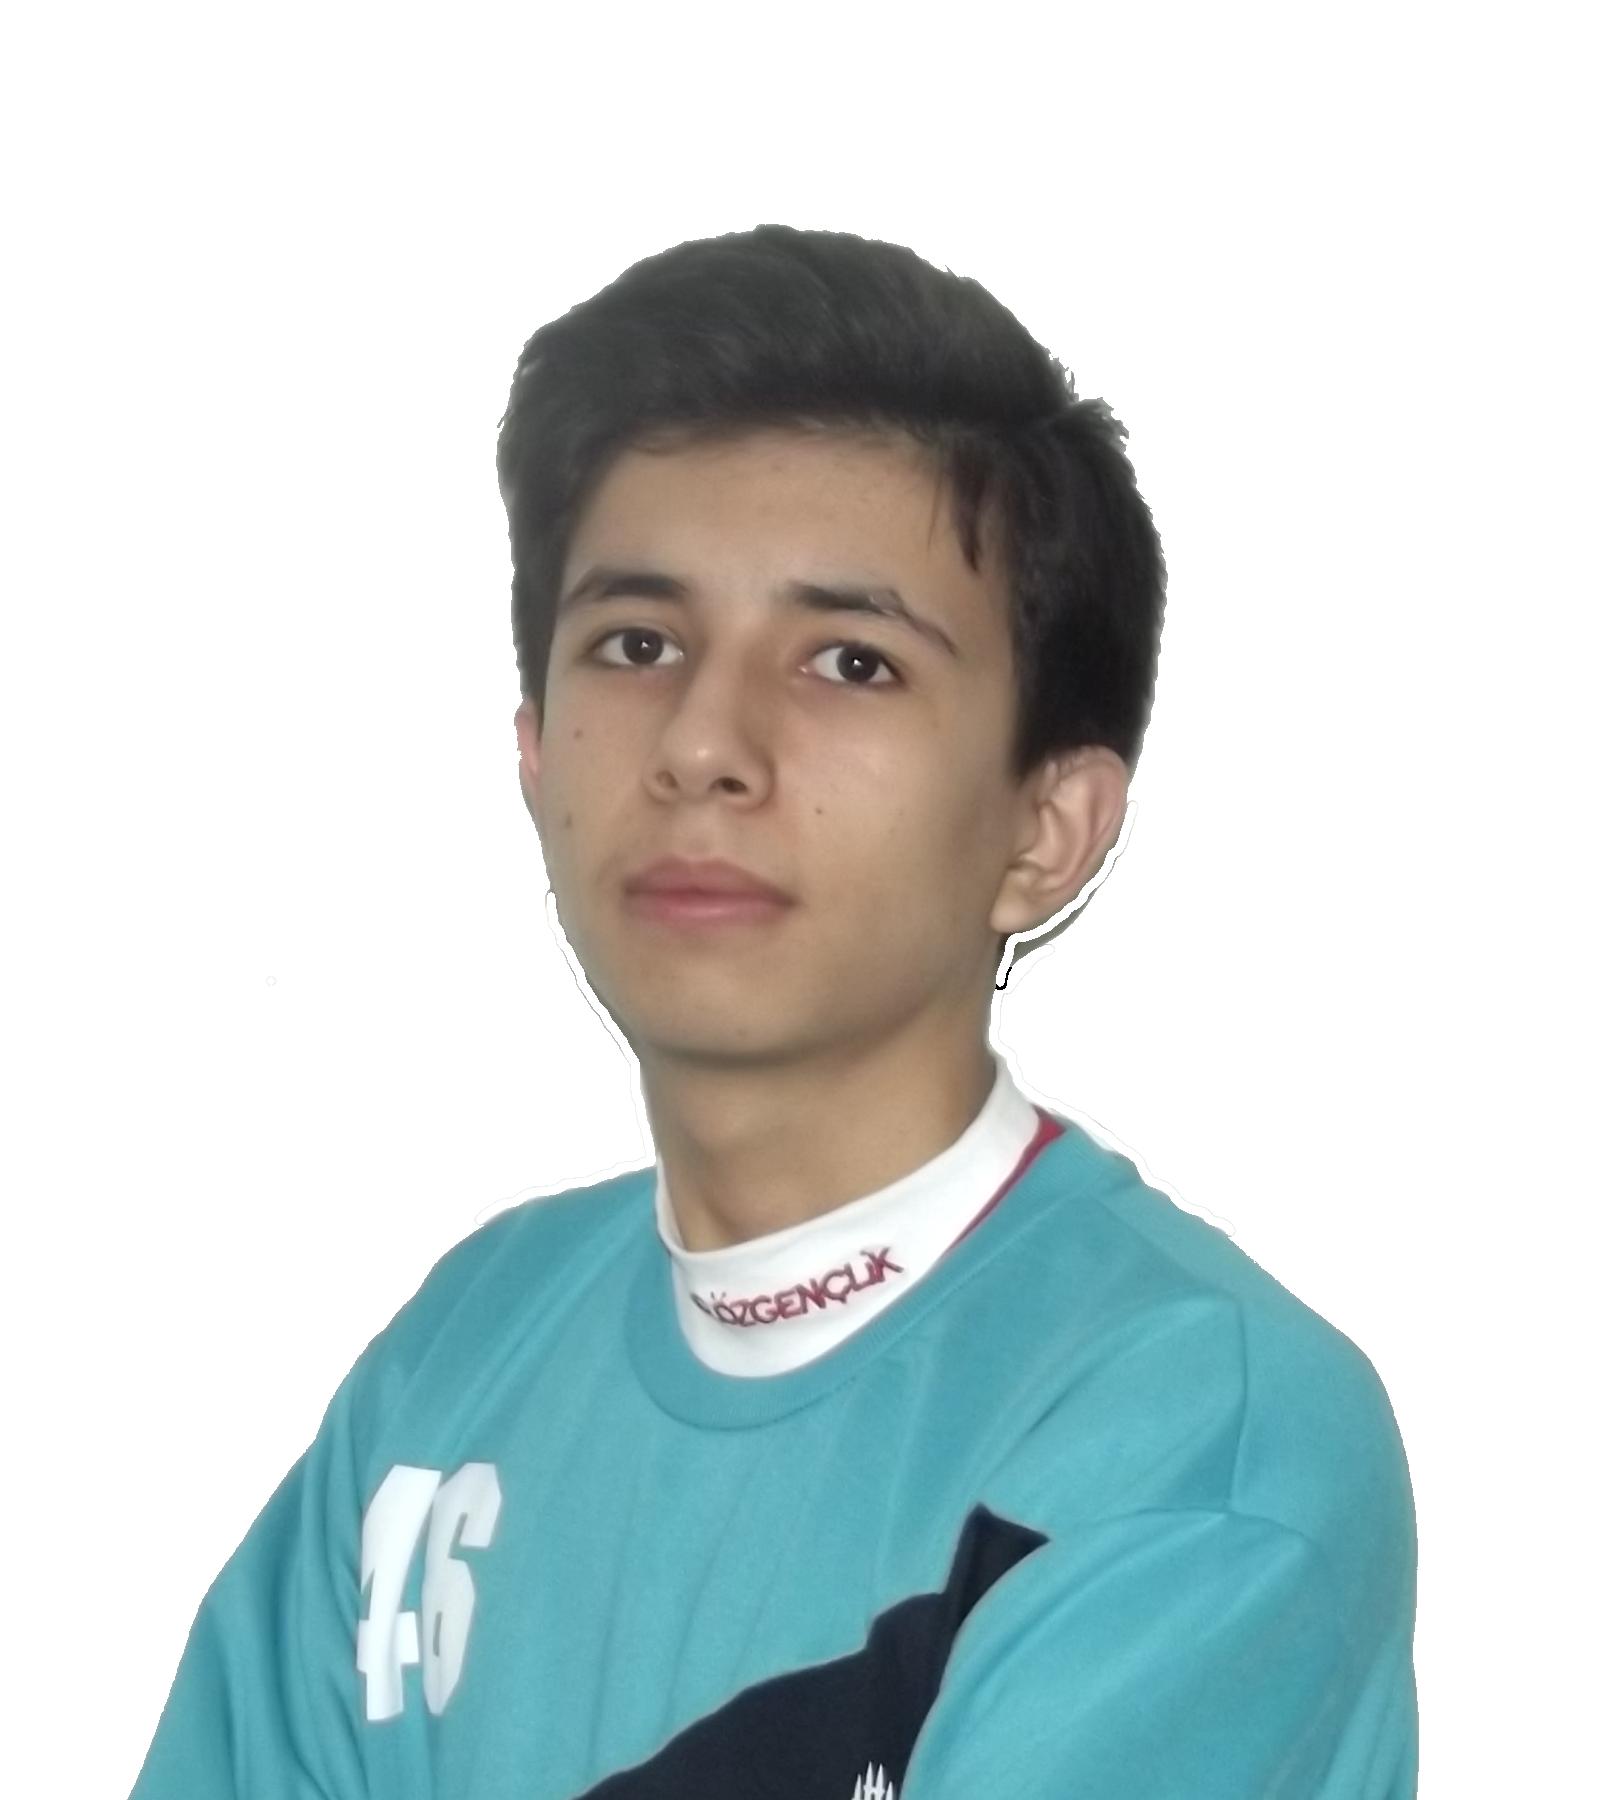 M. Mustafa Gökdeniz